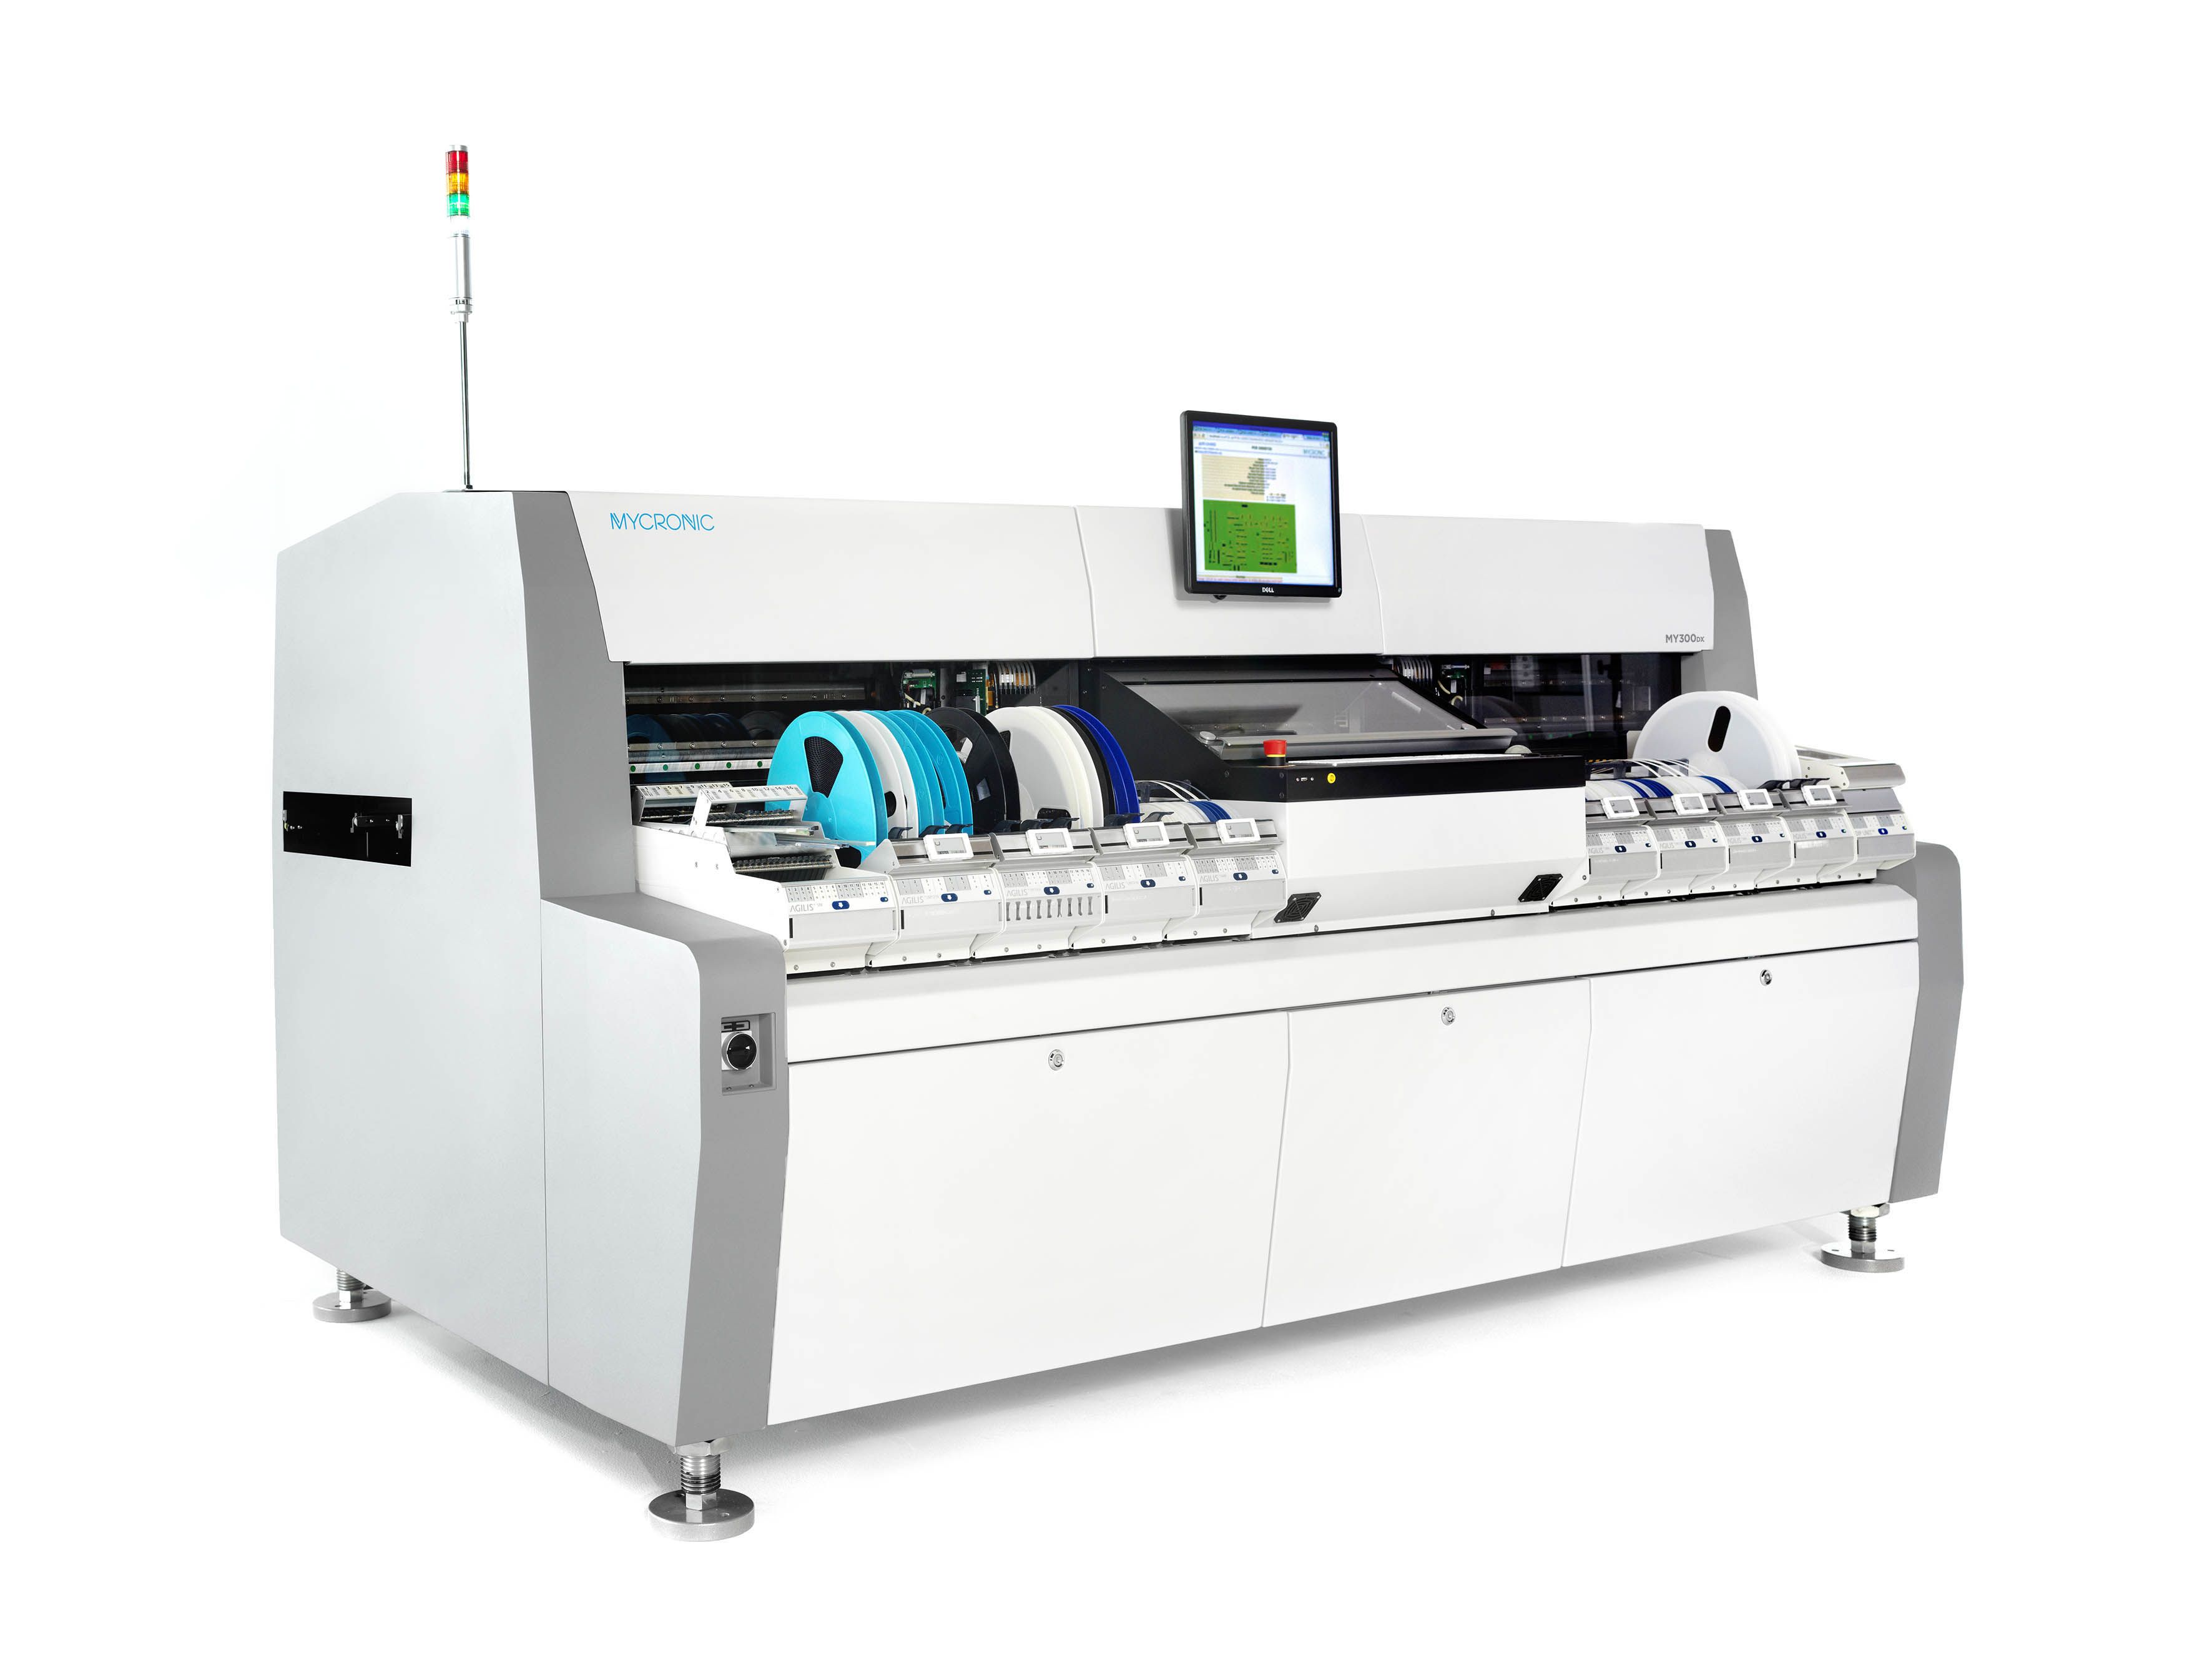 Mycronic - automaattiset SMD-ladontakoneet